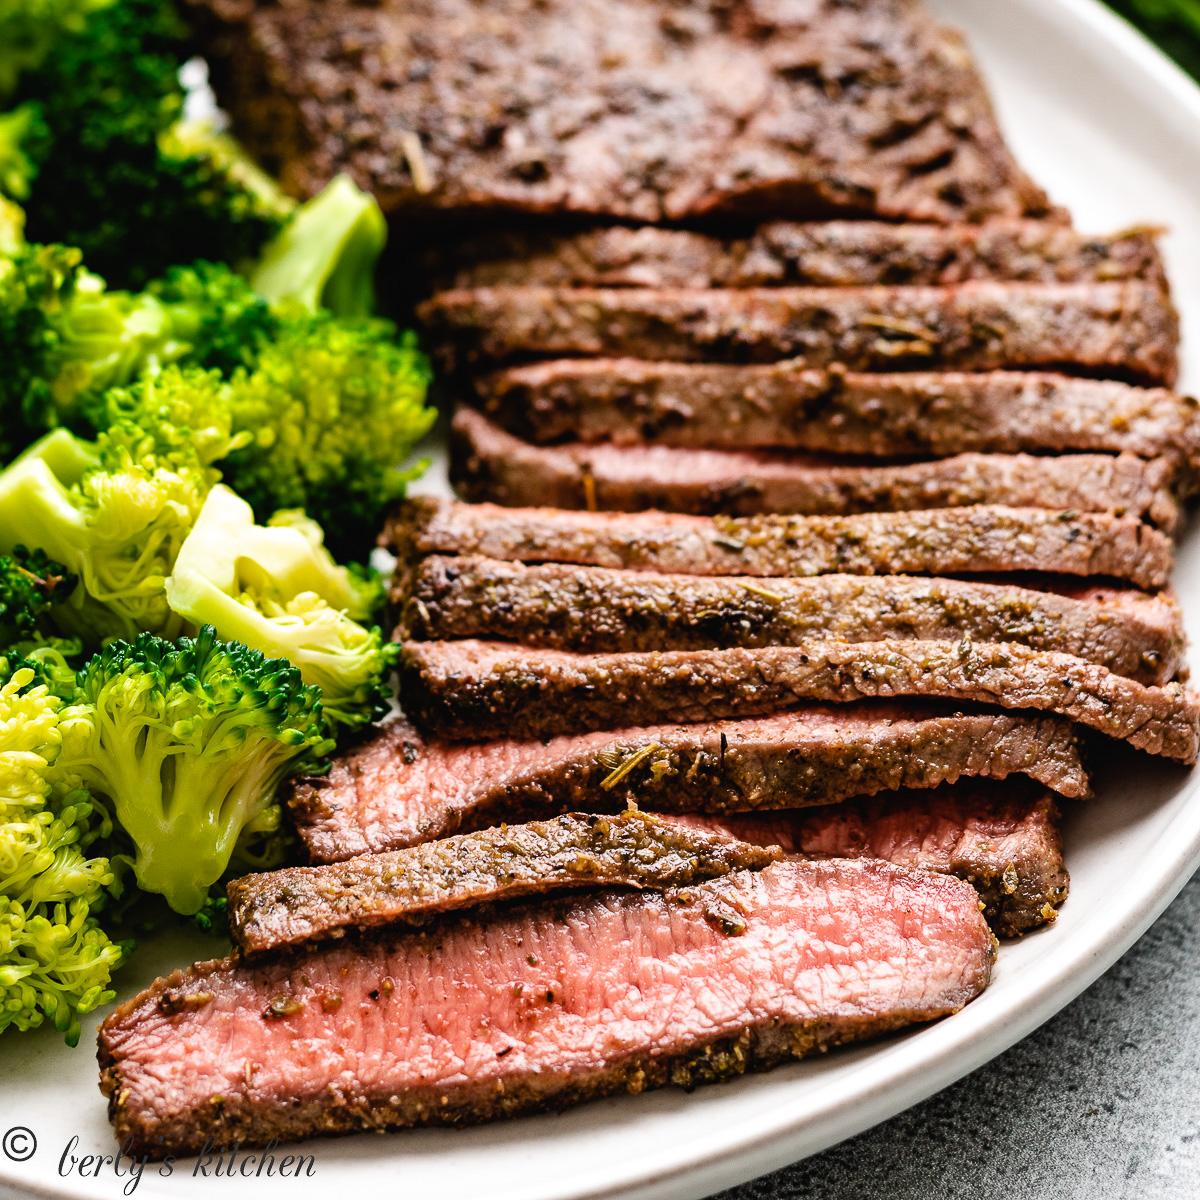 Sliced flat iron steak on a plate.